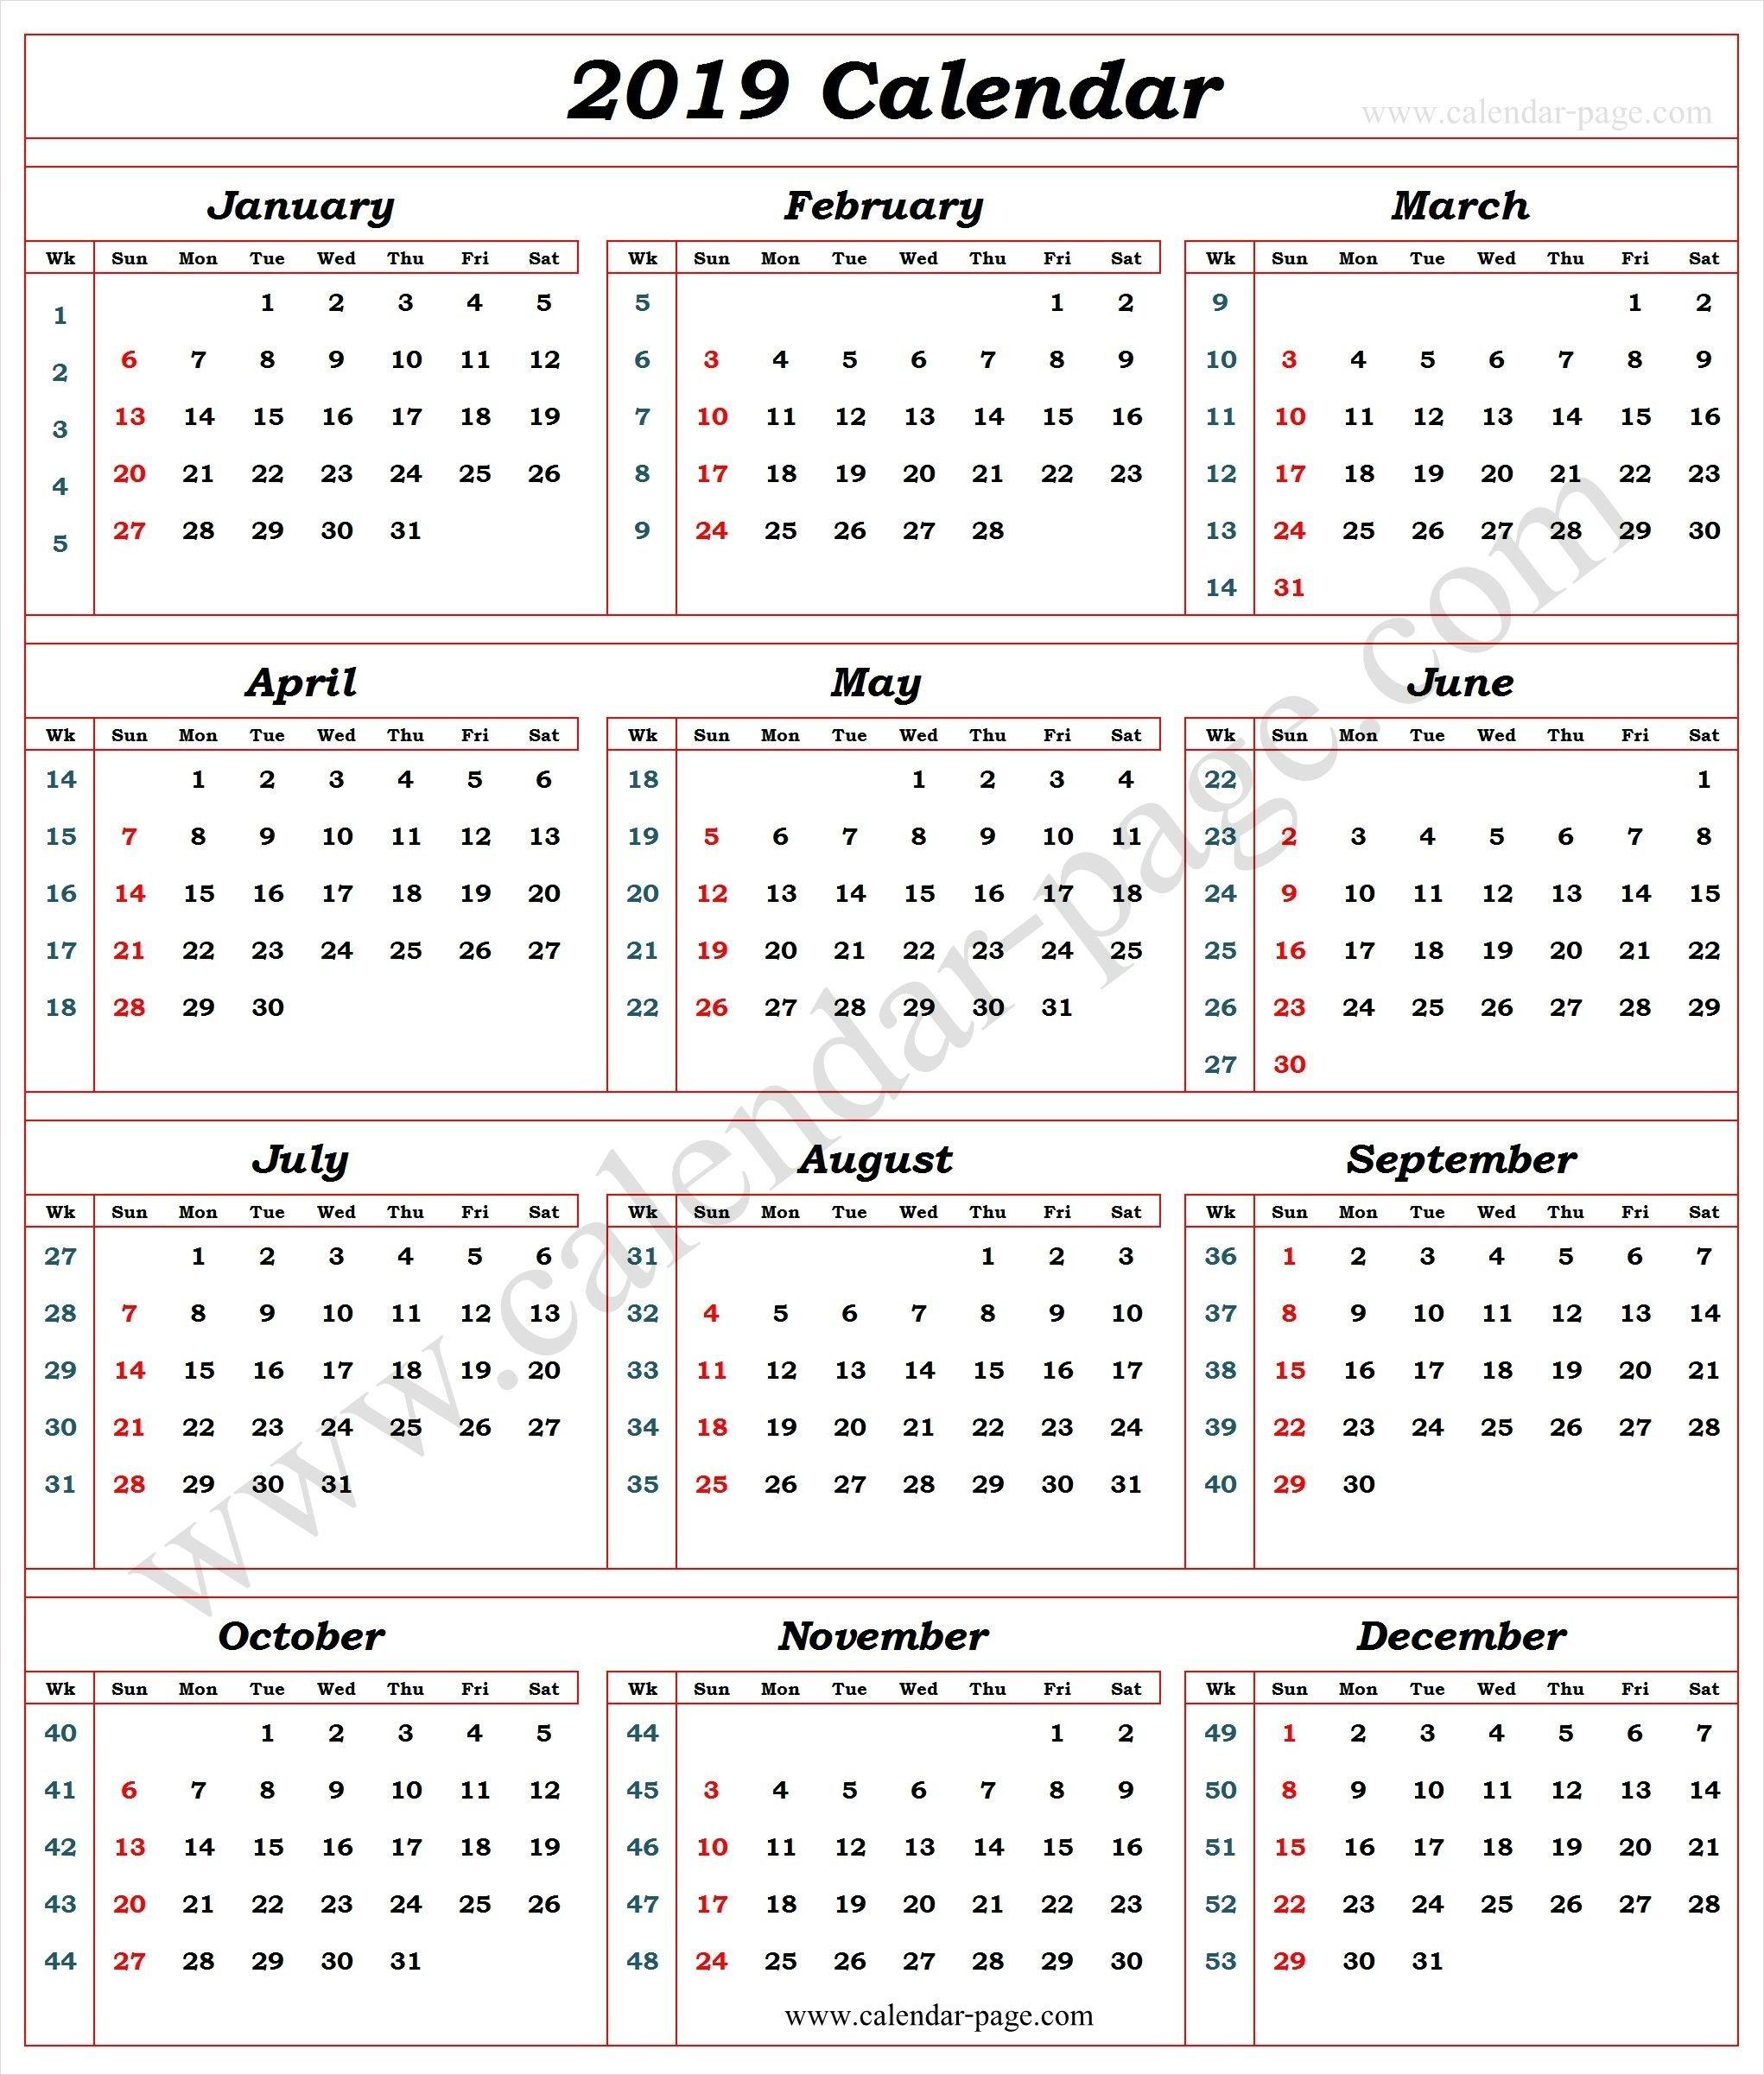 Calendar 2019 With Week Numbers | 2019 Calendar Template | Calendar Calendar Week 30 2019